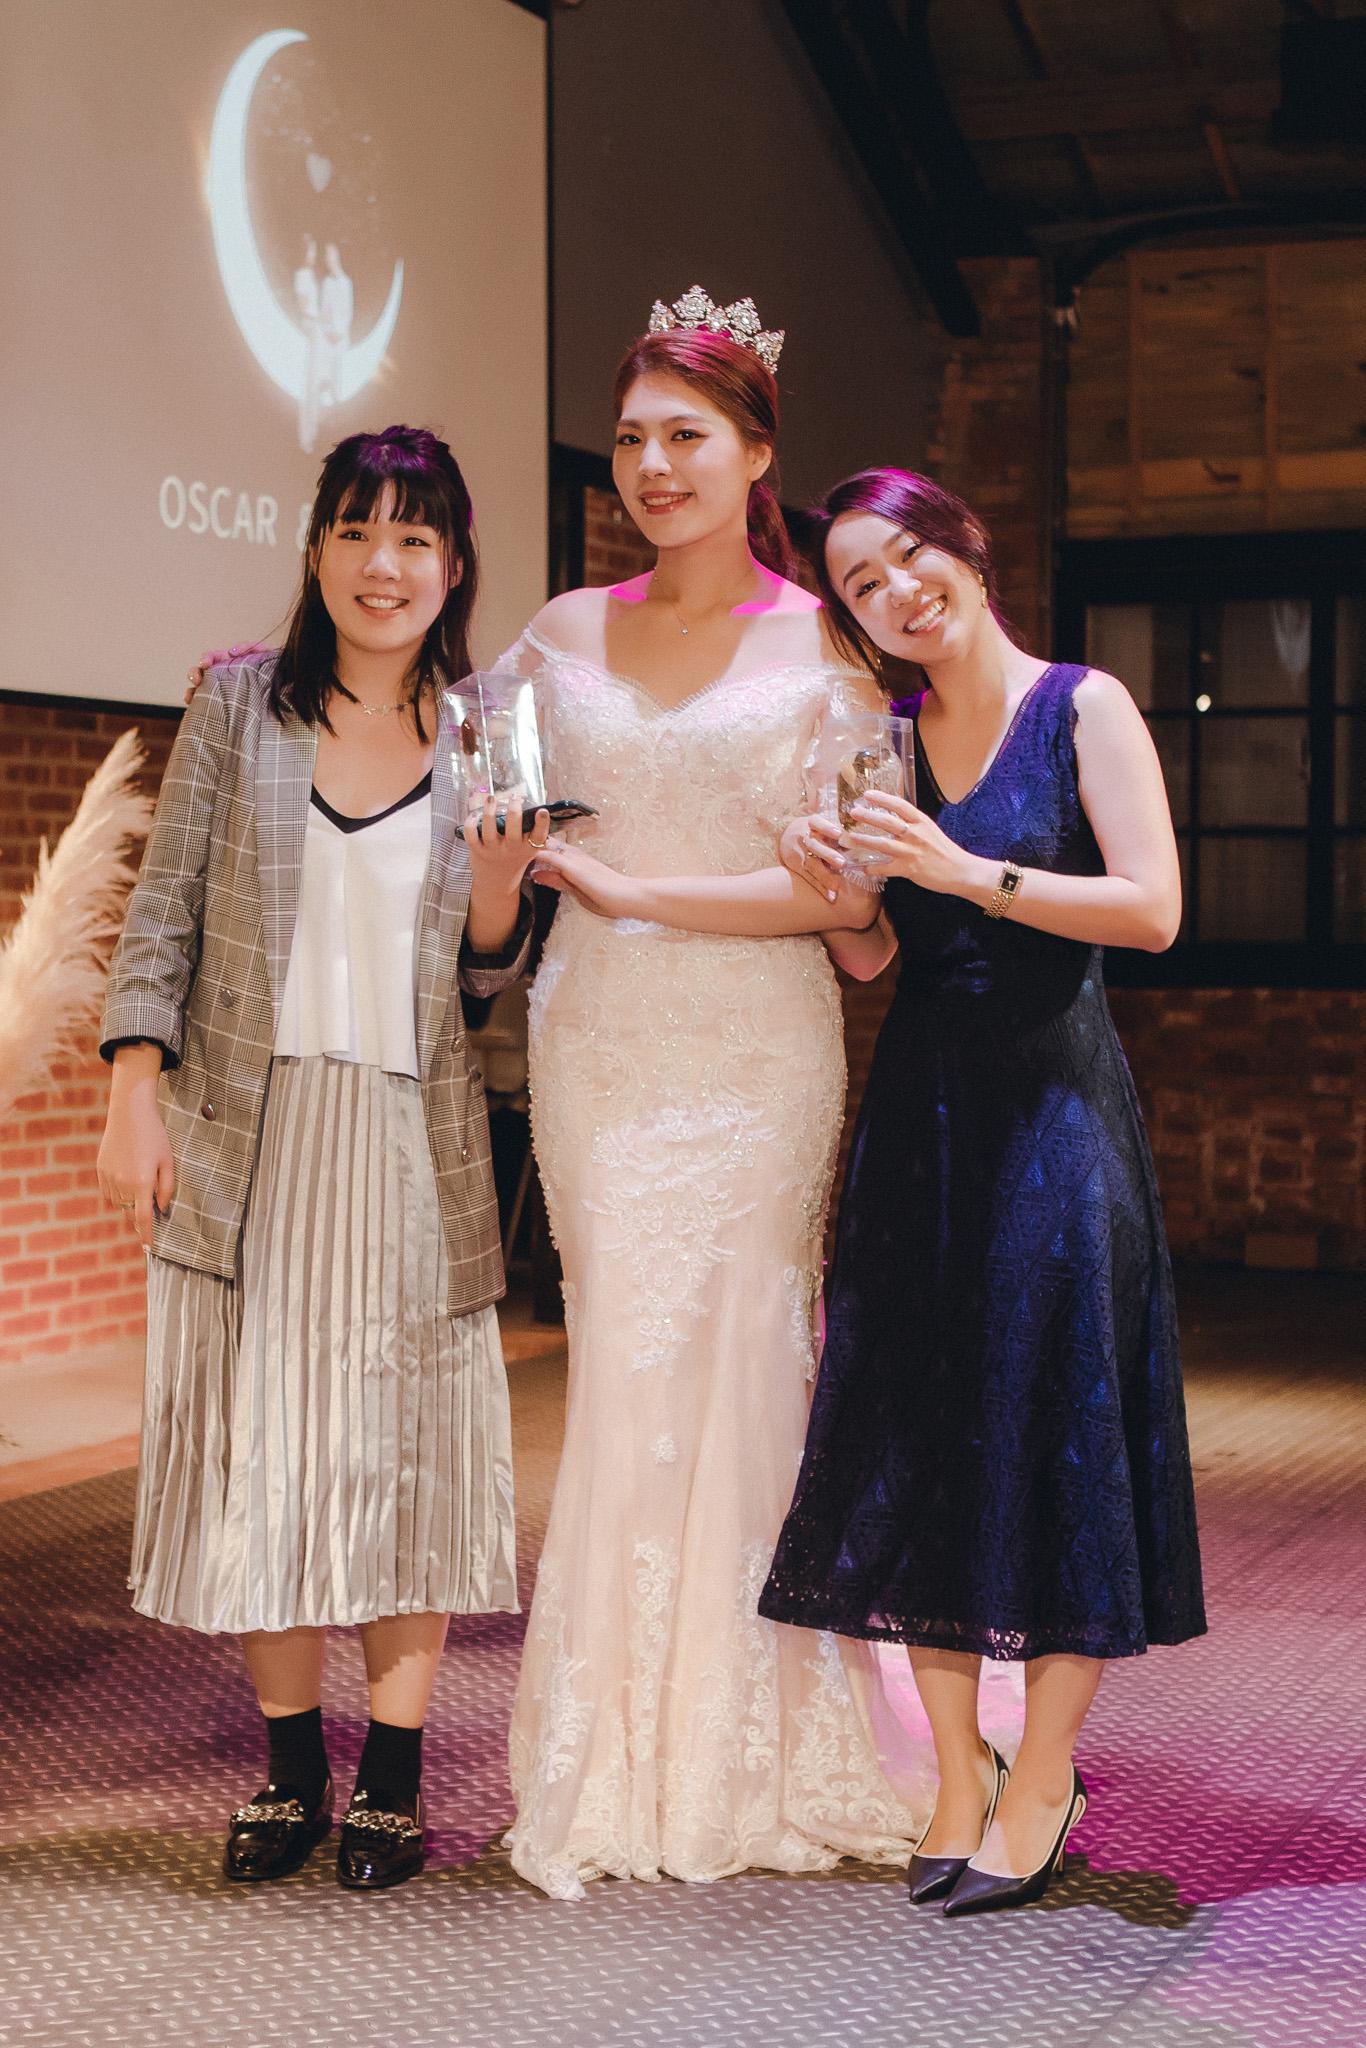 EW 台北婚攝 居米 濟南教會 Brick Yard 33 美軍俱樂部 婚禮 婚宴-106